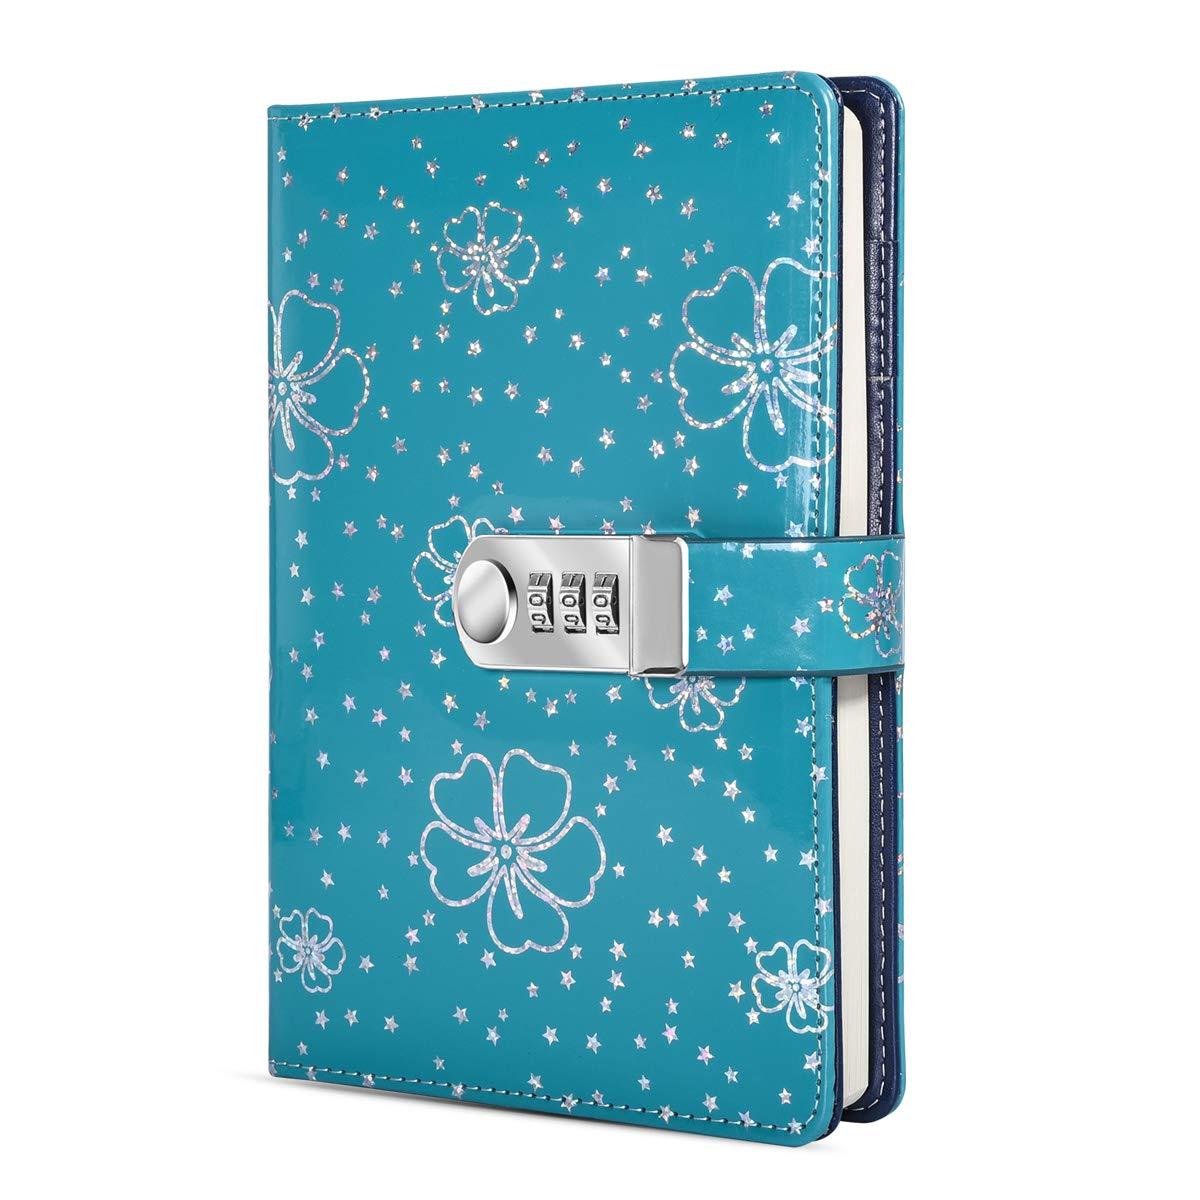 ARRLSDB PU Leather Journal with Lock, A5 Size Diary with Combination Lock (Journal with Combination Lock) Password Notebook Locking Student Diary Notepad (Green) by ARRLSDB